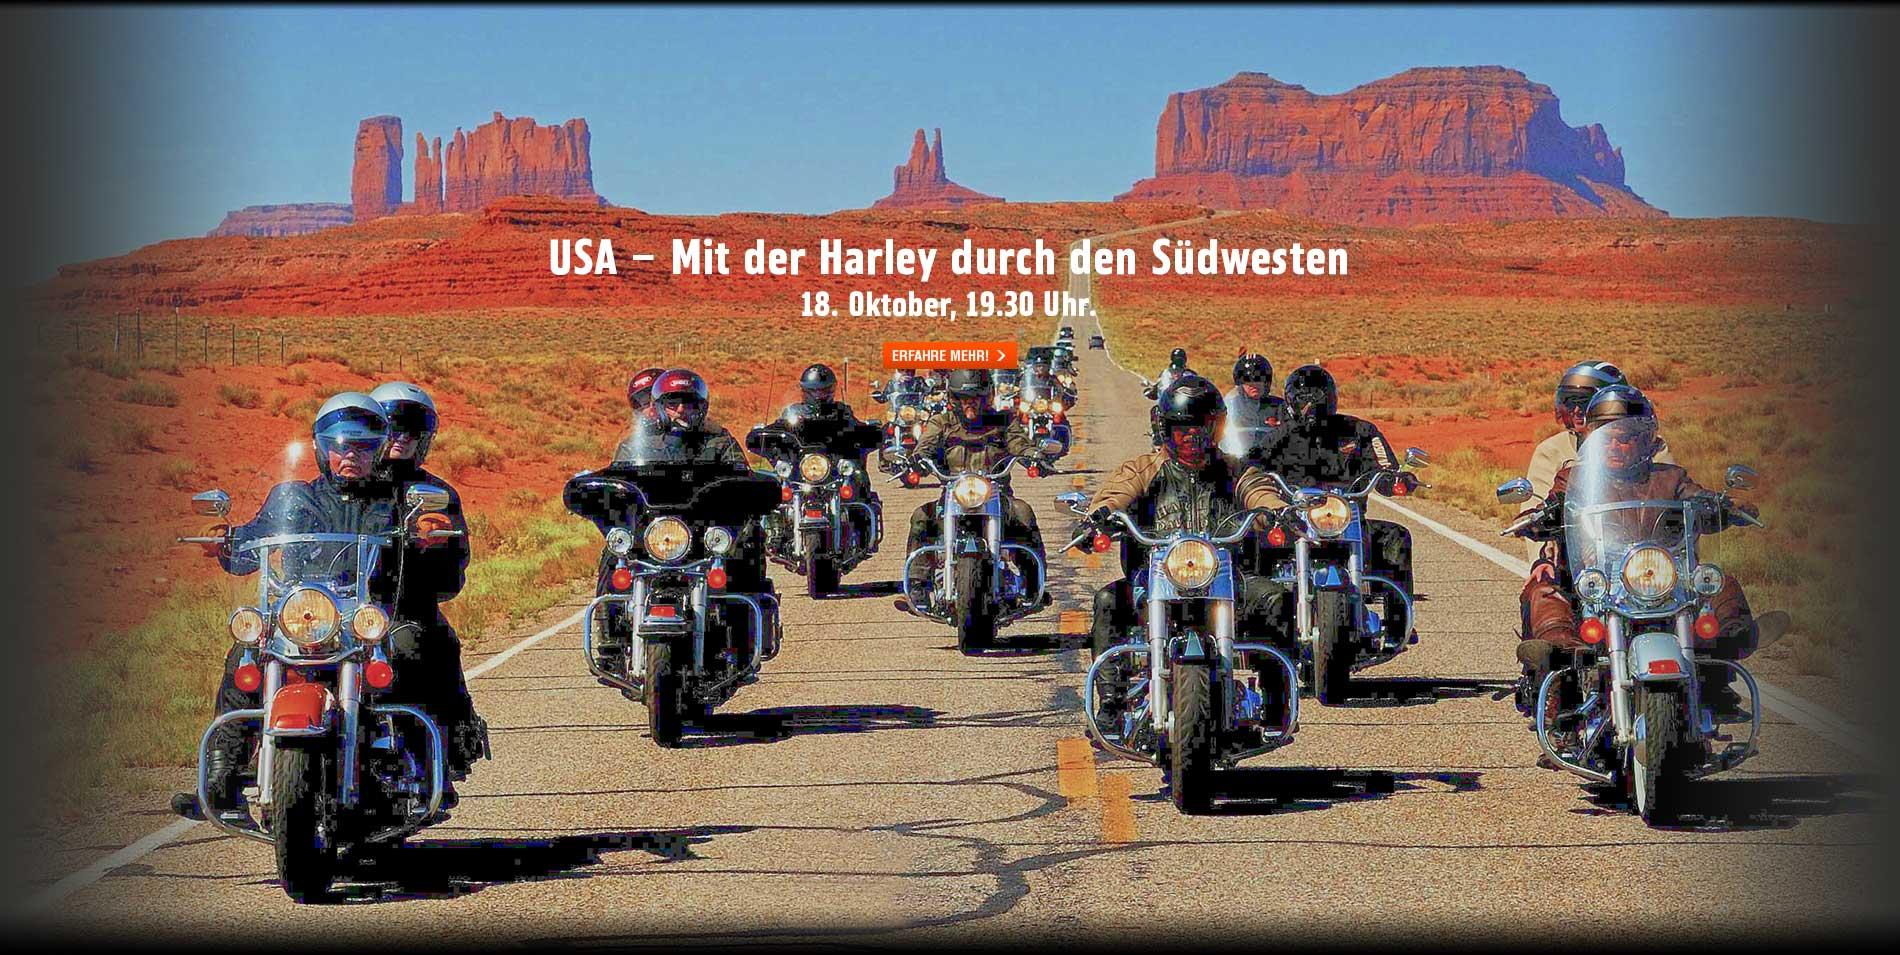 hd_kassel_website_billboard_vortrag_1900x955